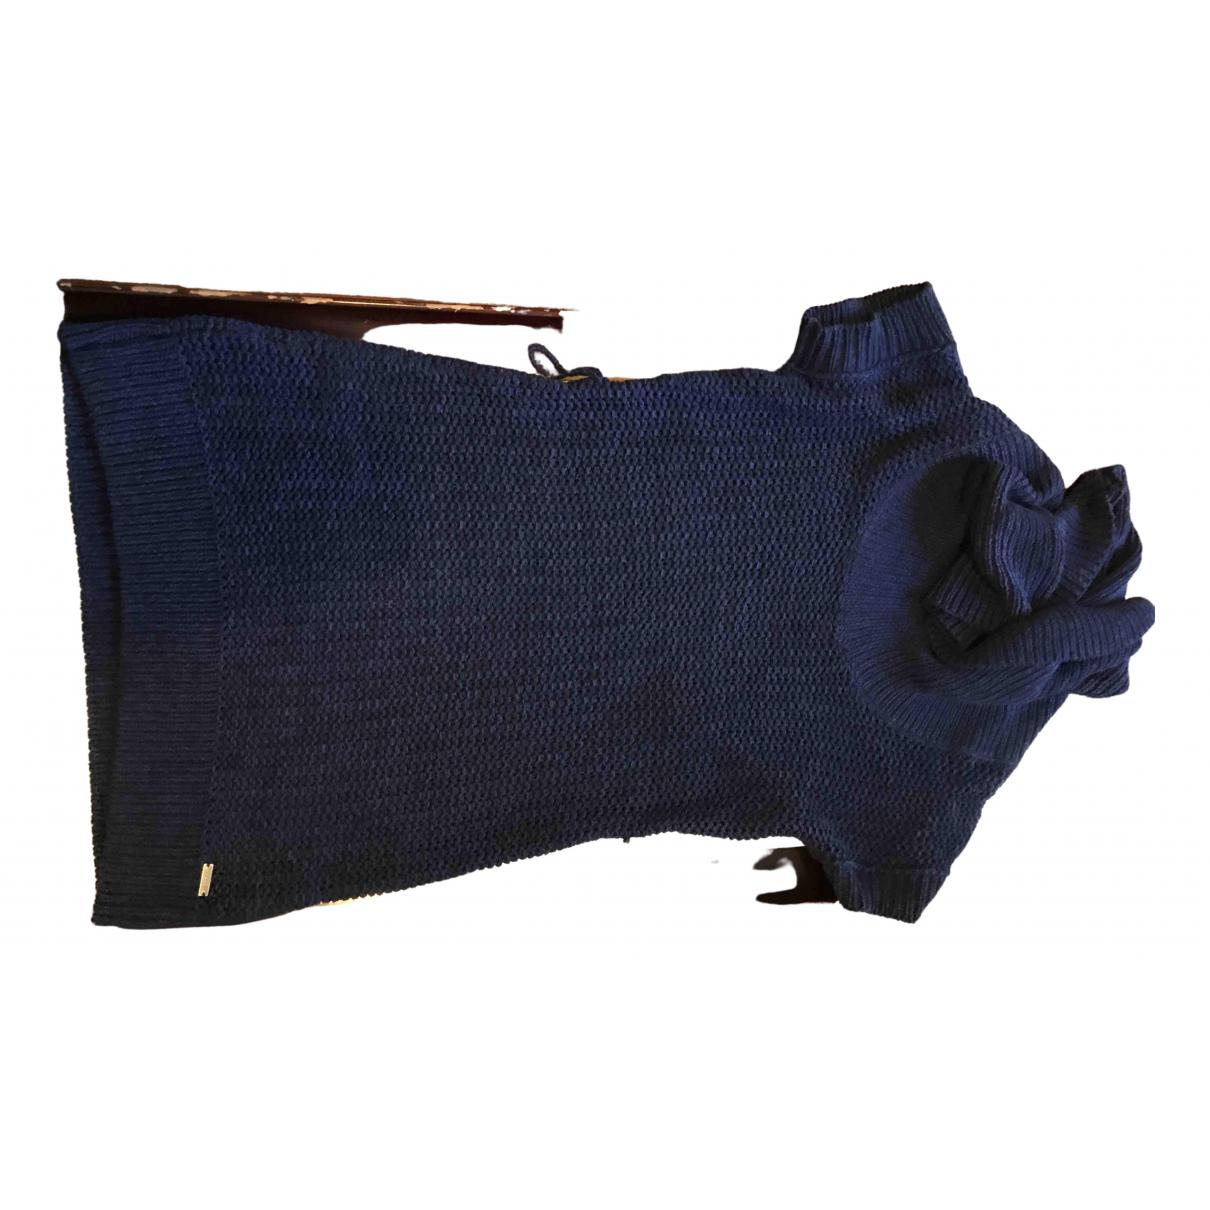 Guess \N Blue Cotton Knitwear for Women S International